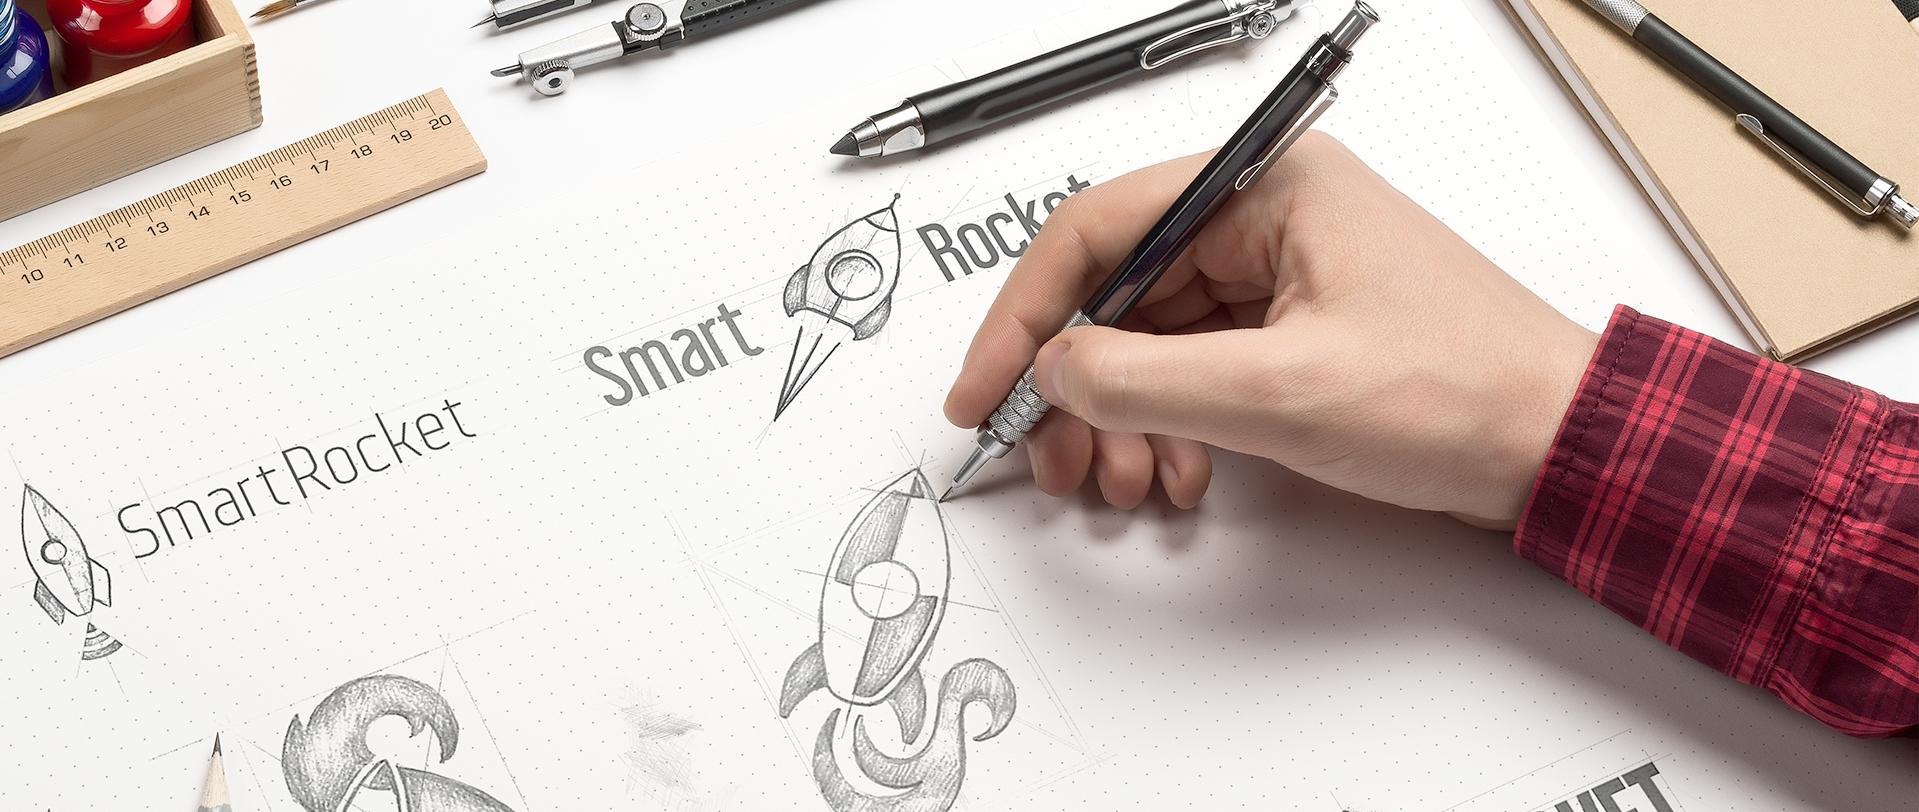 https://media.authentic-studio.com/web-content/uploads/2020/11/mobile-application-branding-illustrations-smart-rocket.jpg